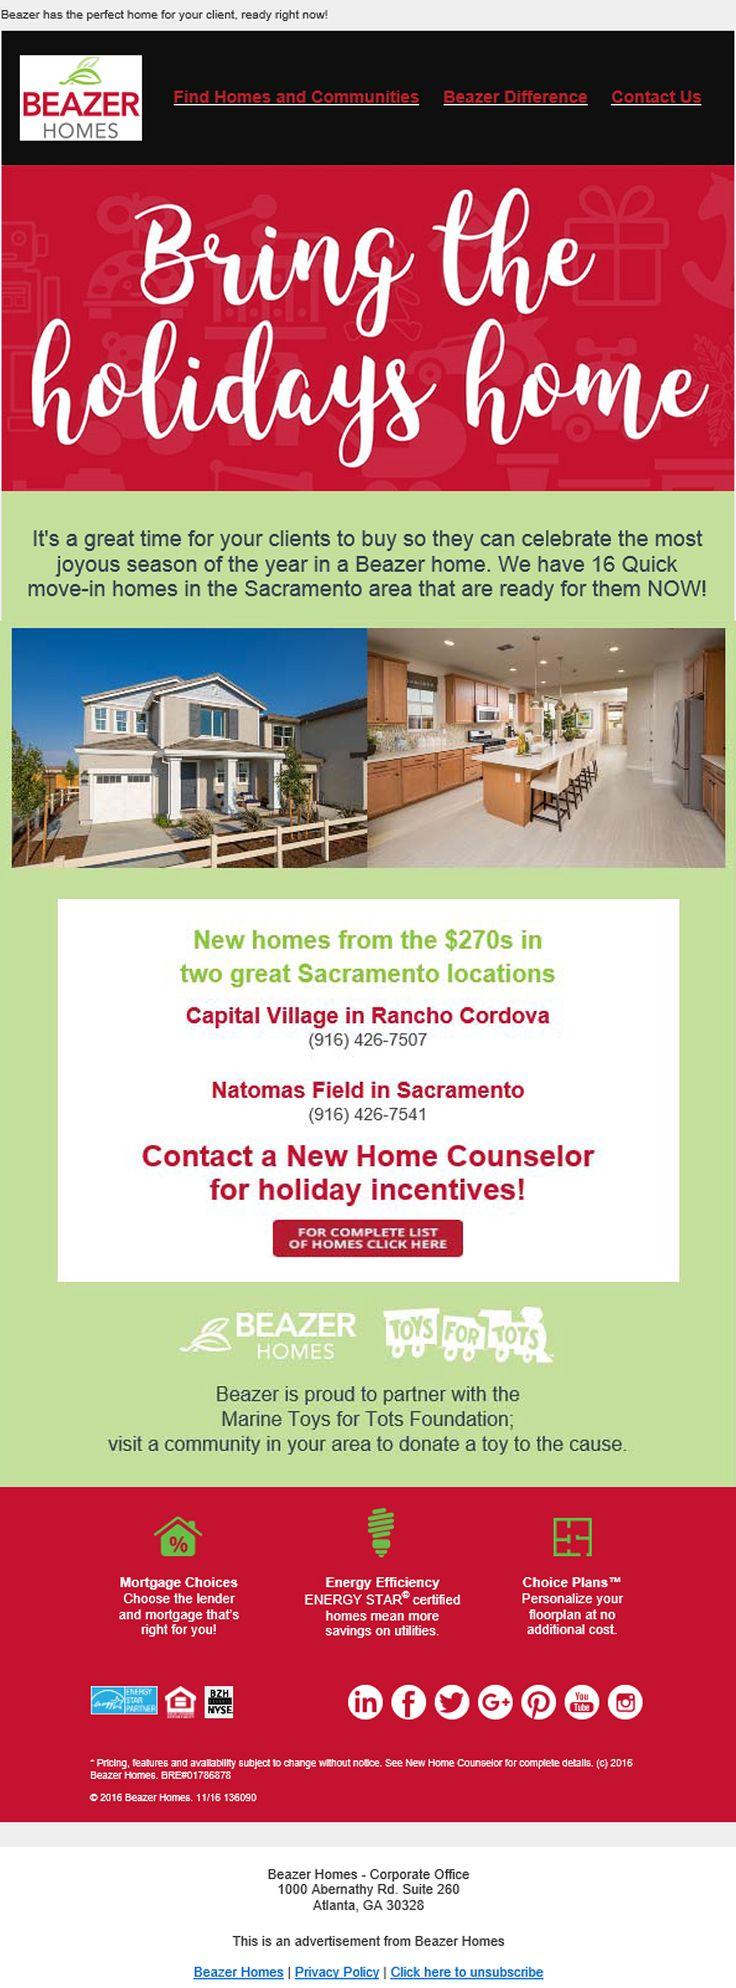 Superior New Homes For Sale In Rancho Cordova, California Sacramento Area Homes From  The $270s